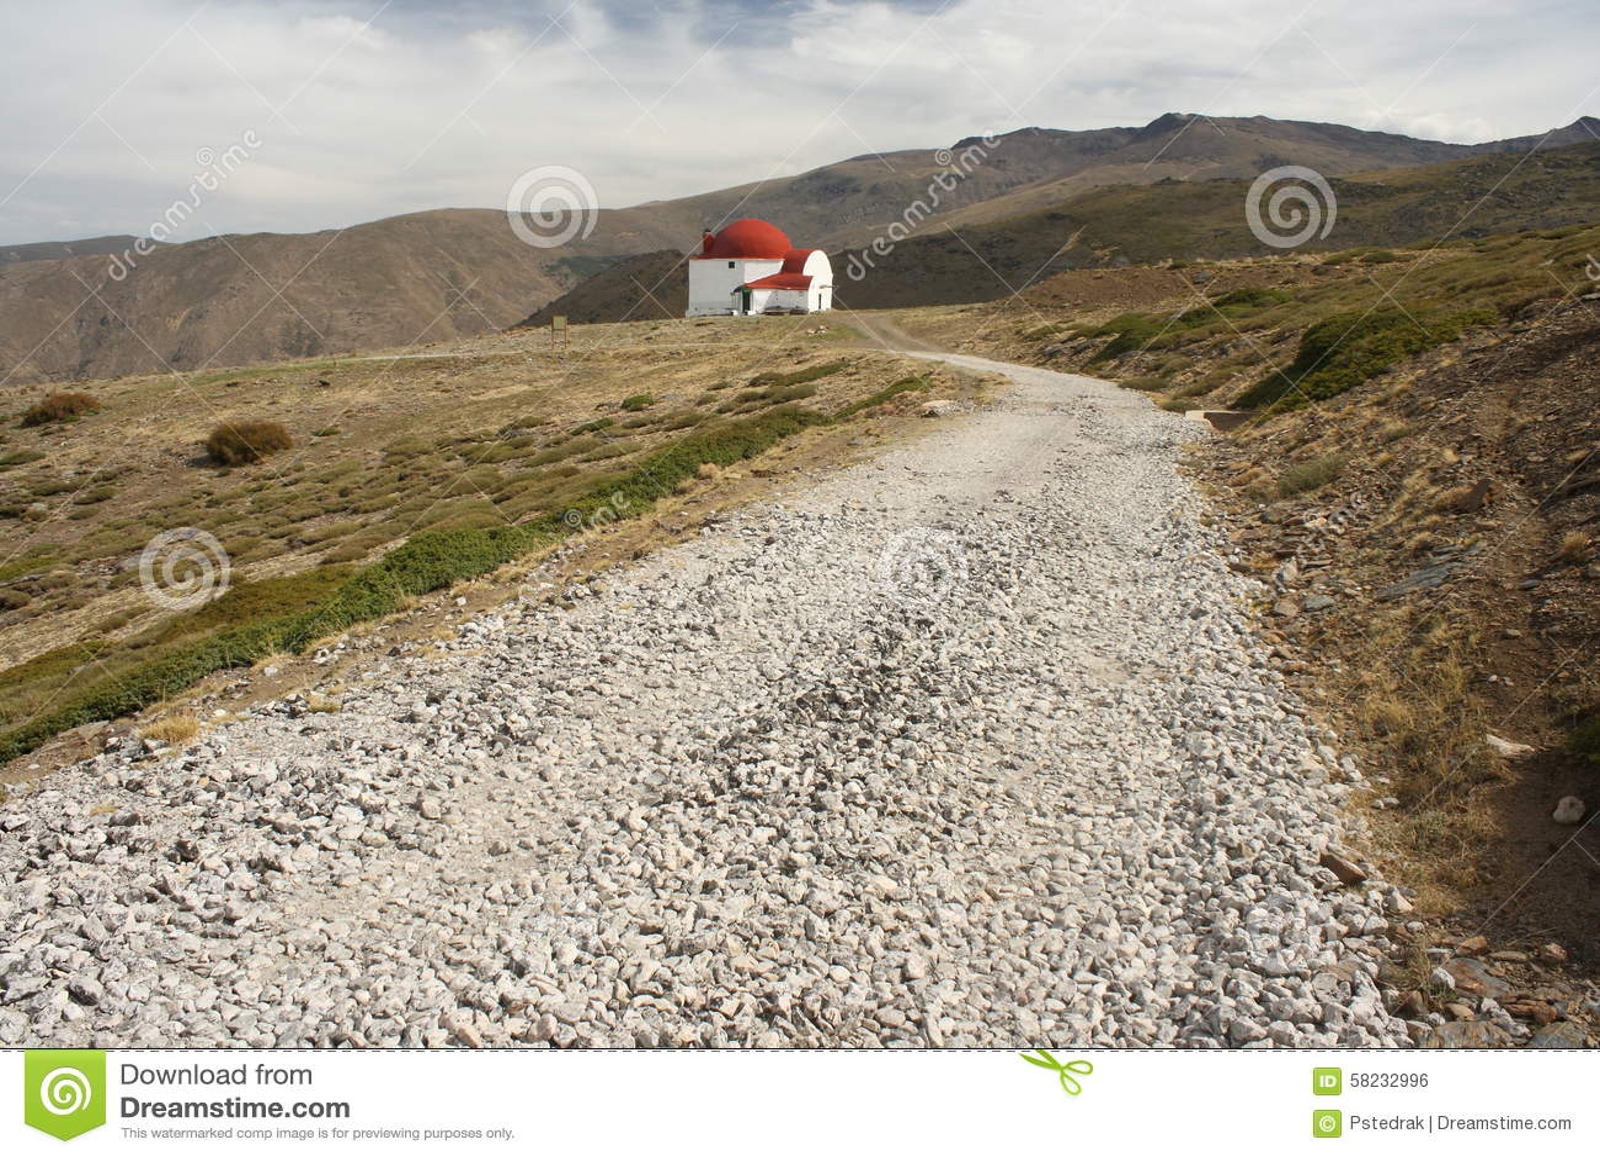 Footpath to San Francisco refuge in Sierra Nevada